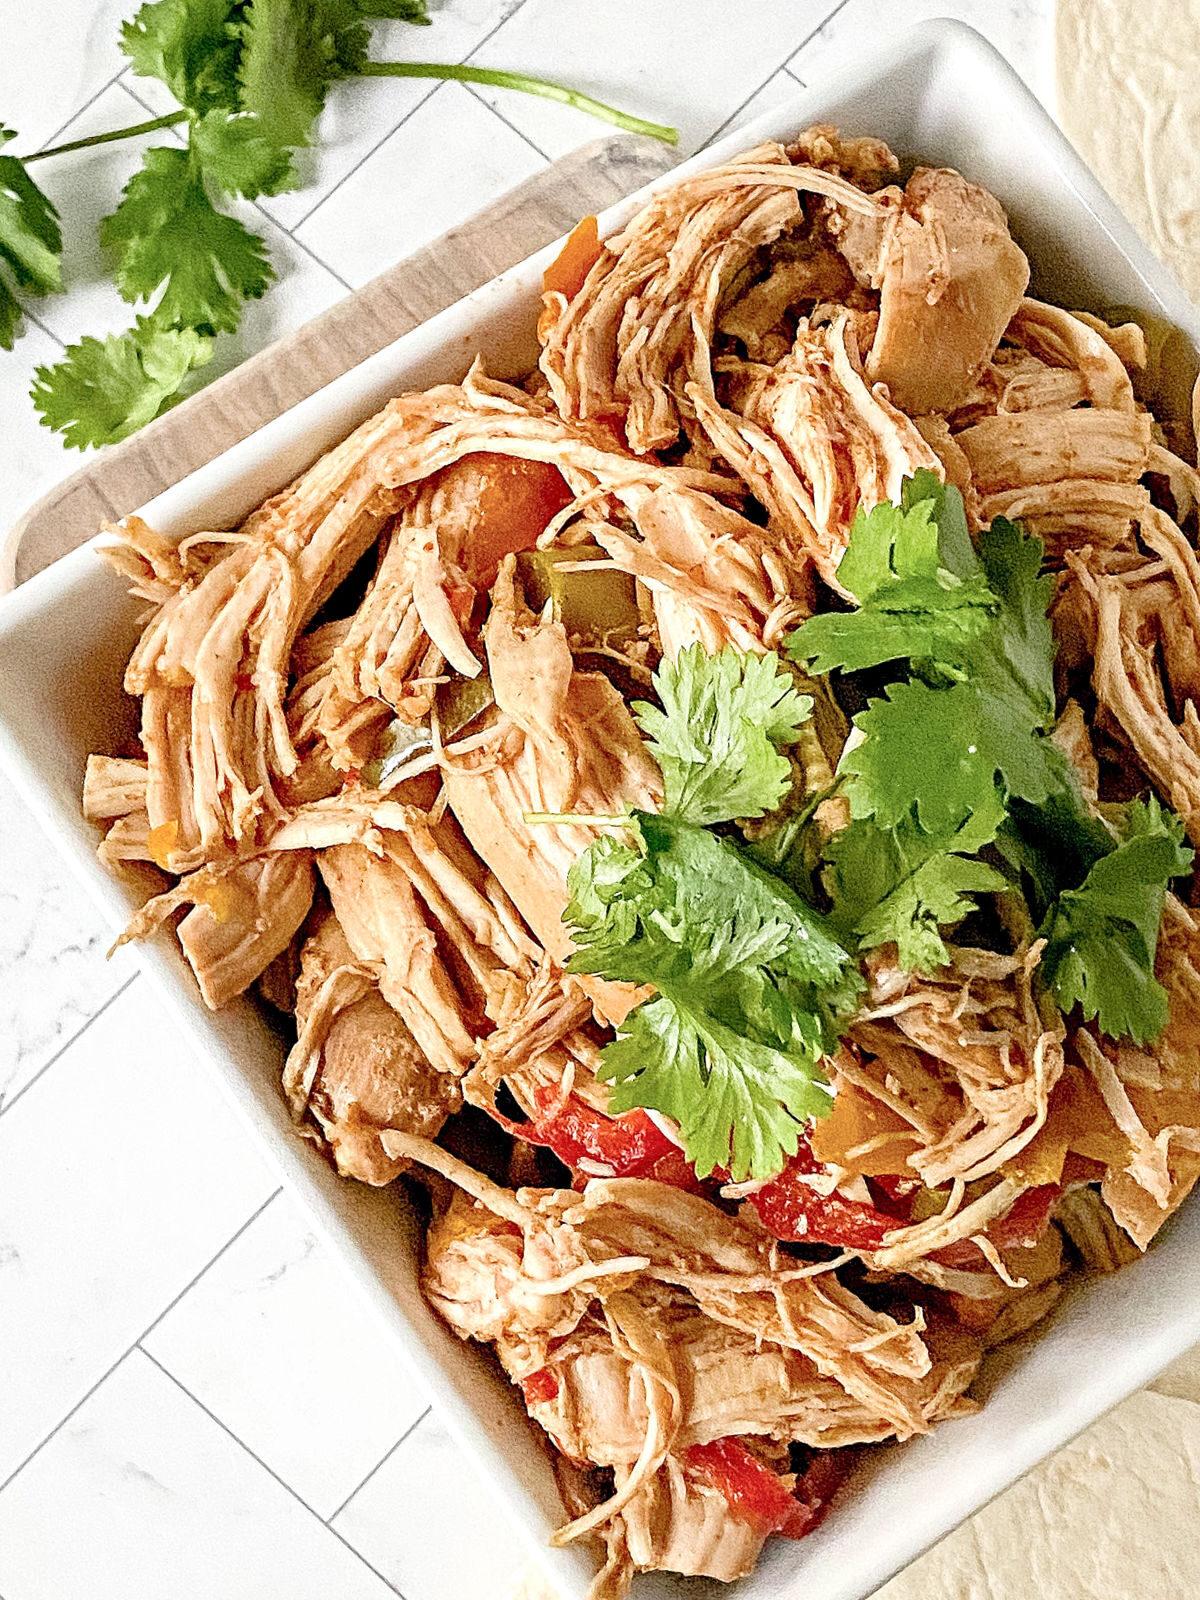 Bowl of shredded chicken seasoned with fajita seasonings.